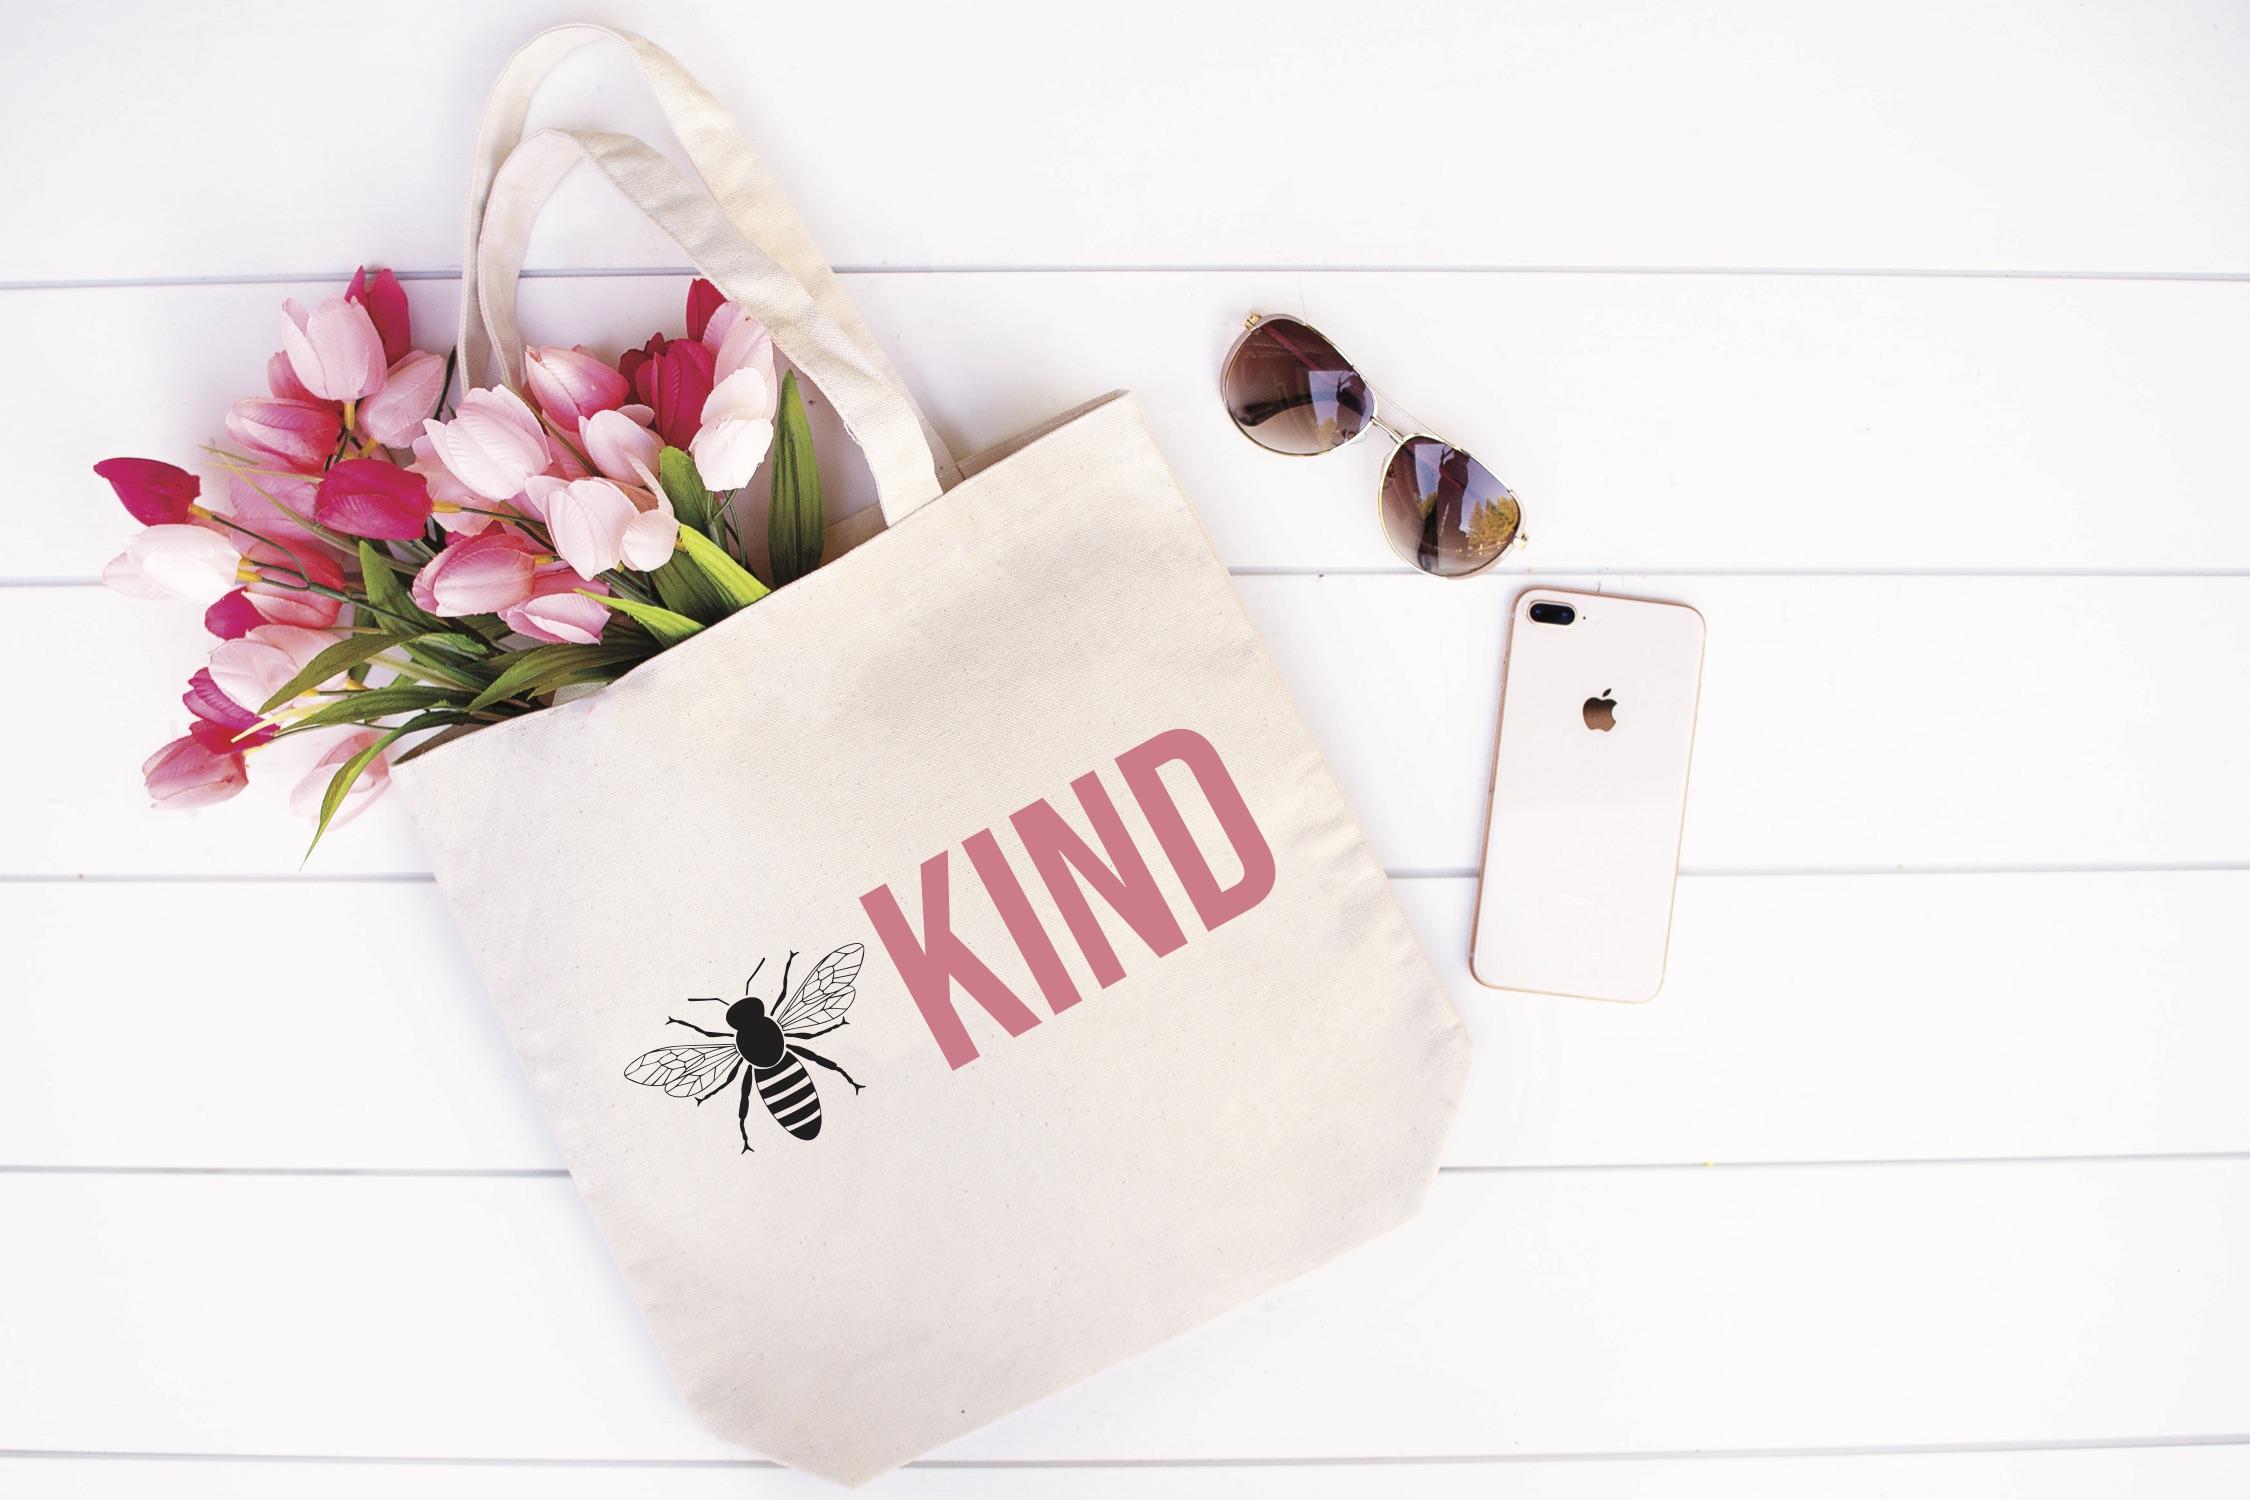 Bee Kind Tote Bag Tulips Sunglasses iPhone